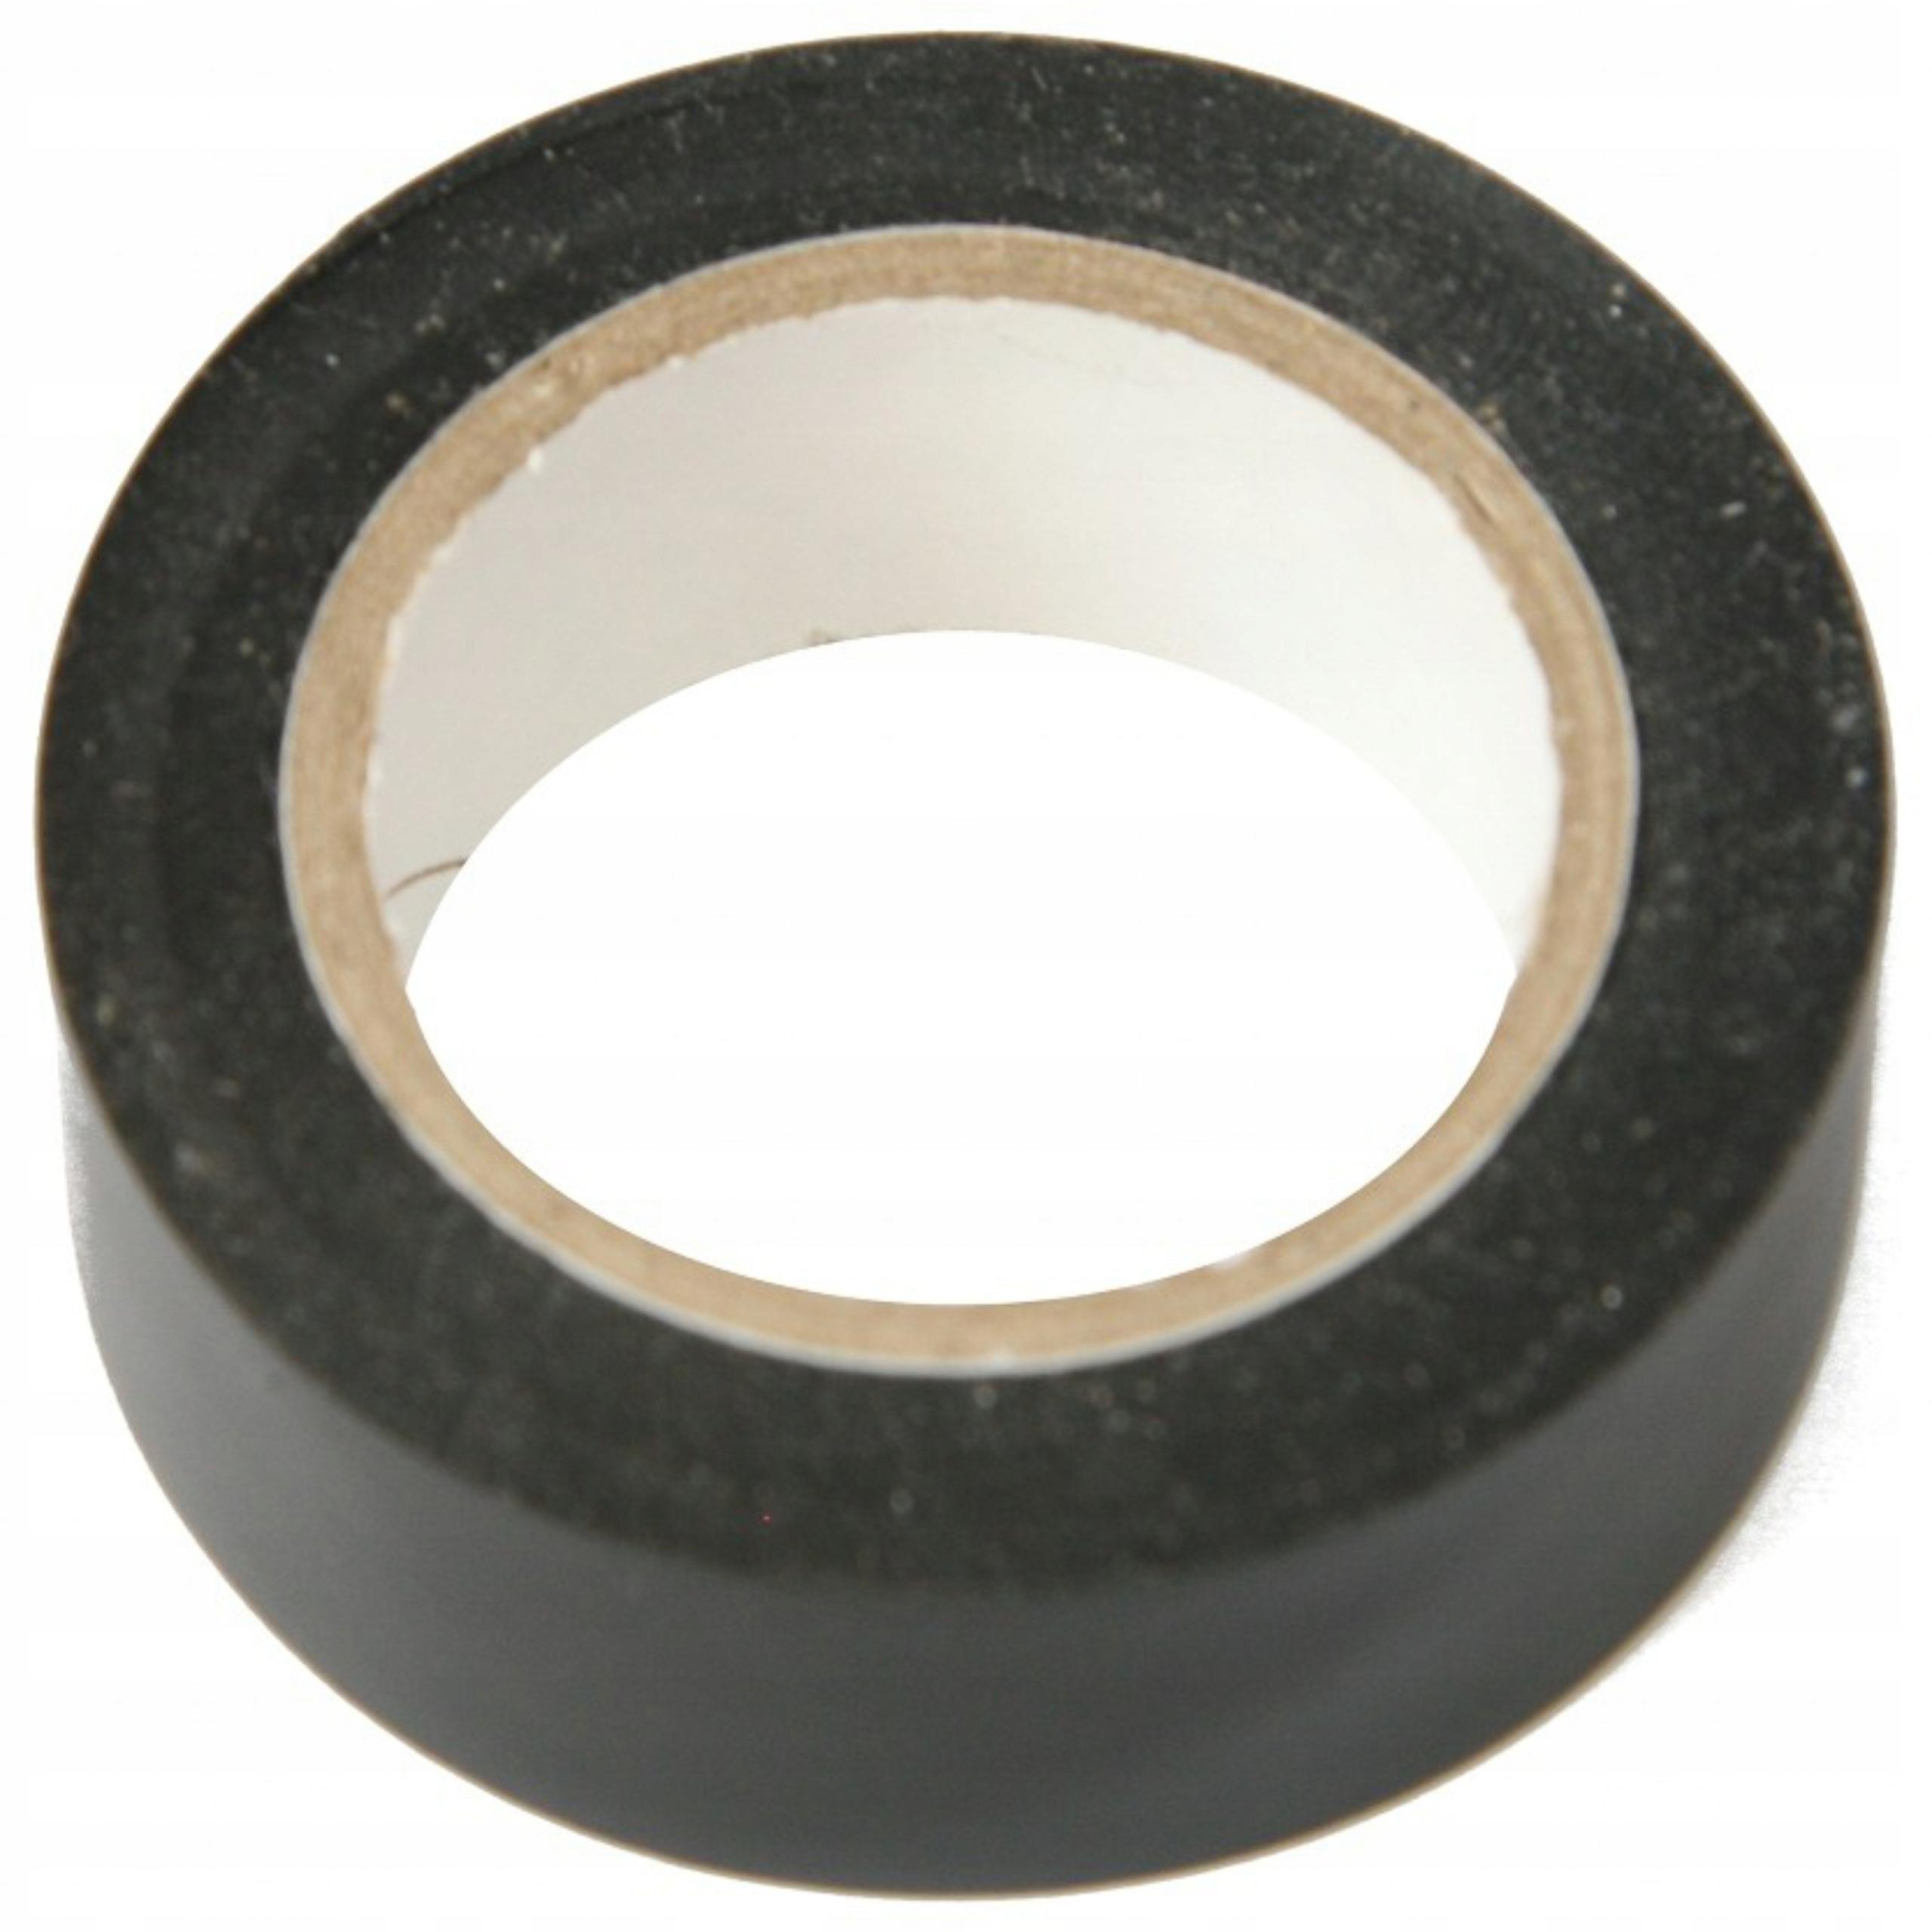 Клейкая лента изоляционная 19мм х 10м черная